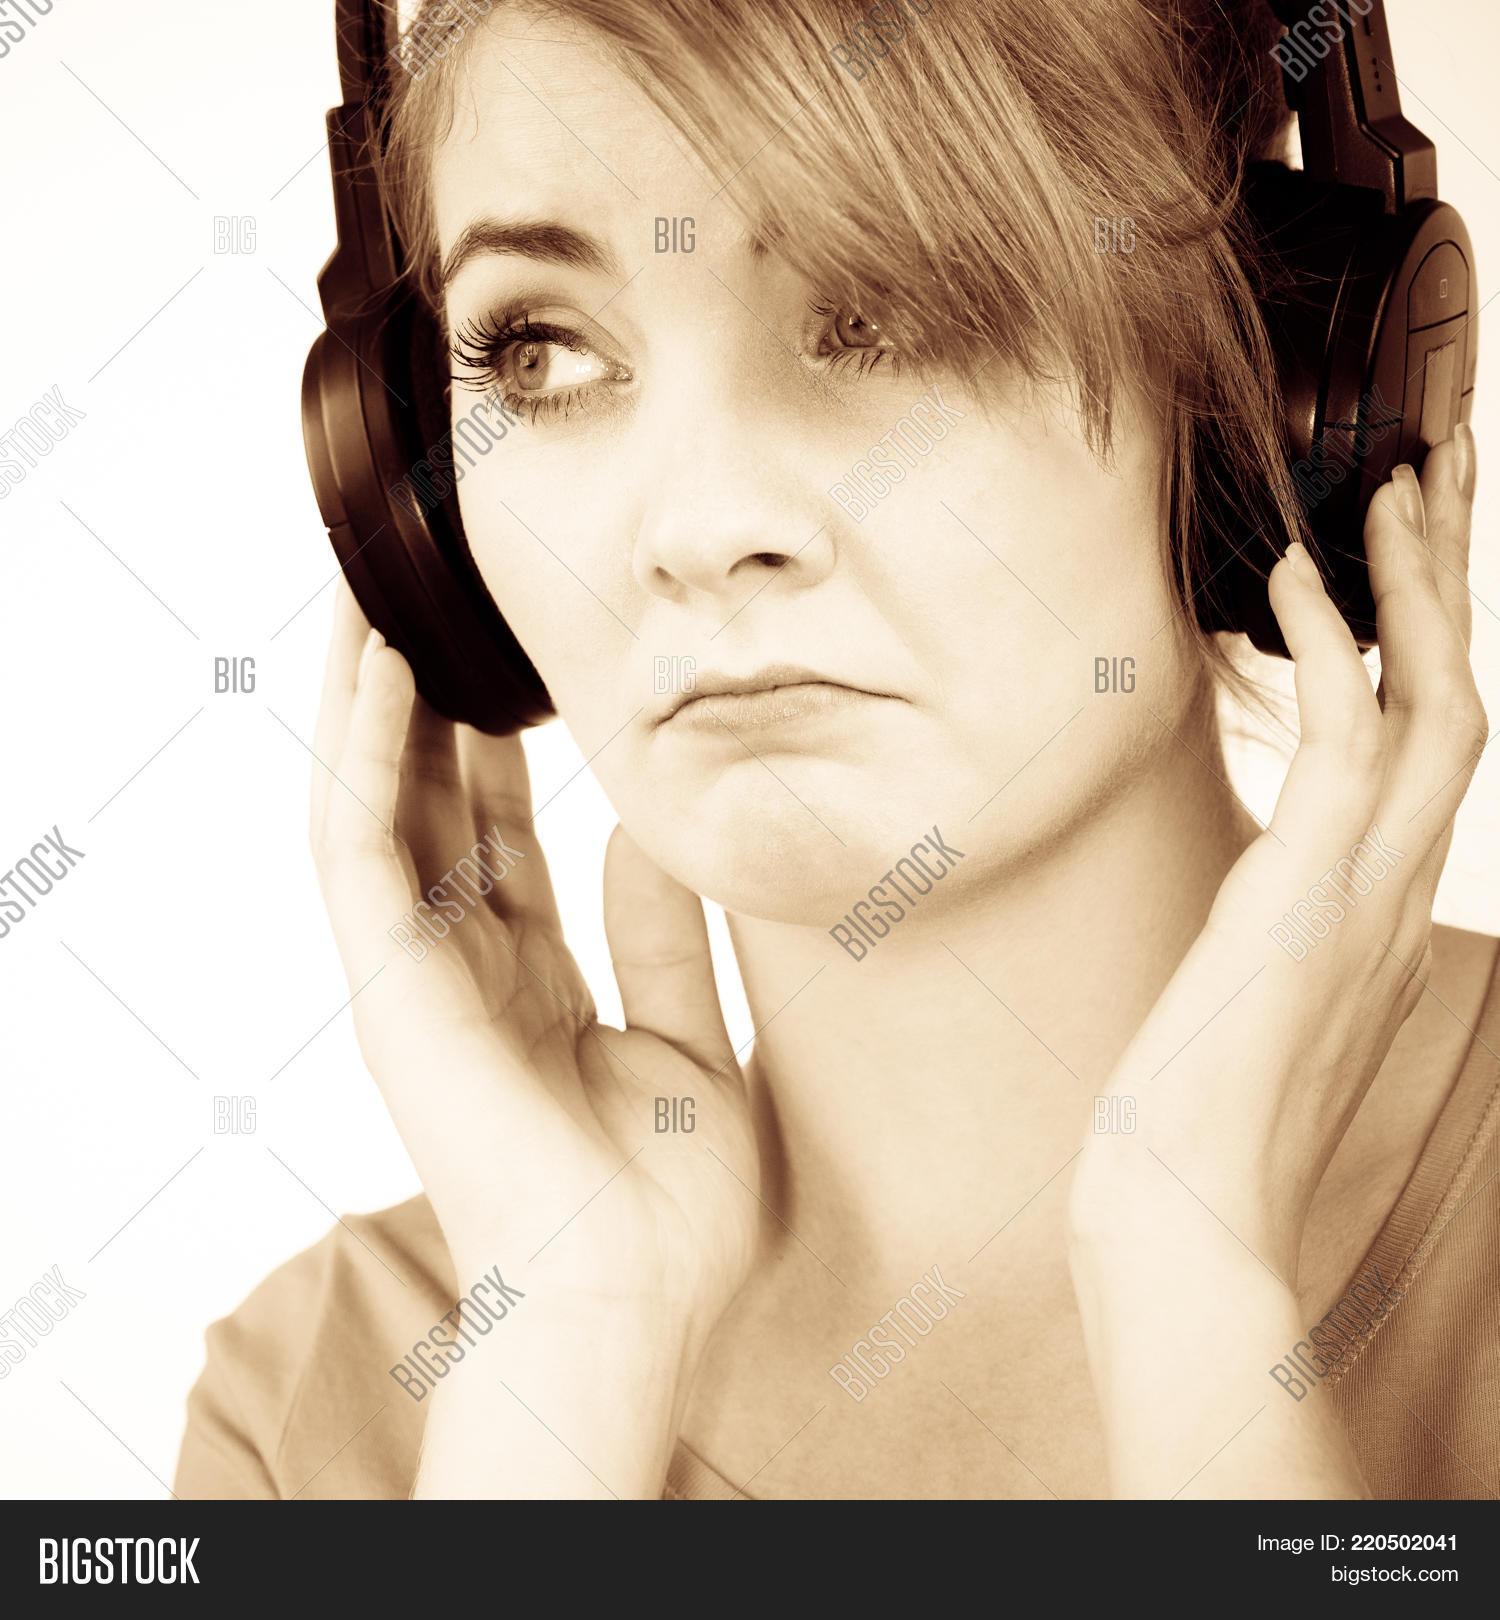 Woman Sad Unhappy Girl Image & Photo (Free Trial) | Bigstock